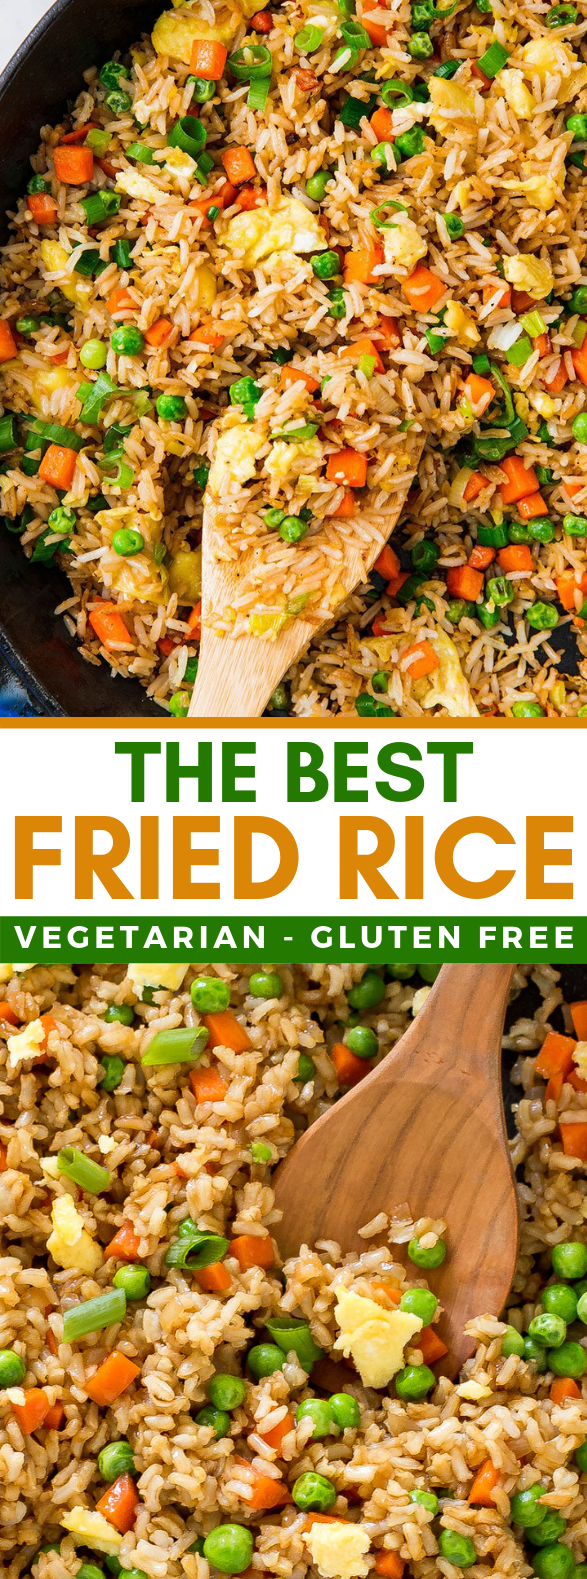 The BEST Fried Rice #veggies #vegetables